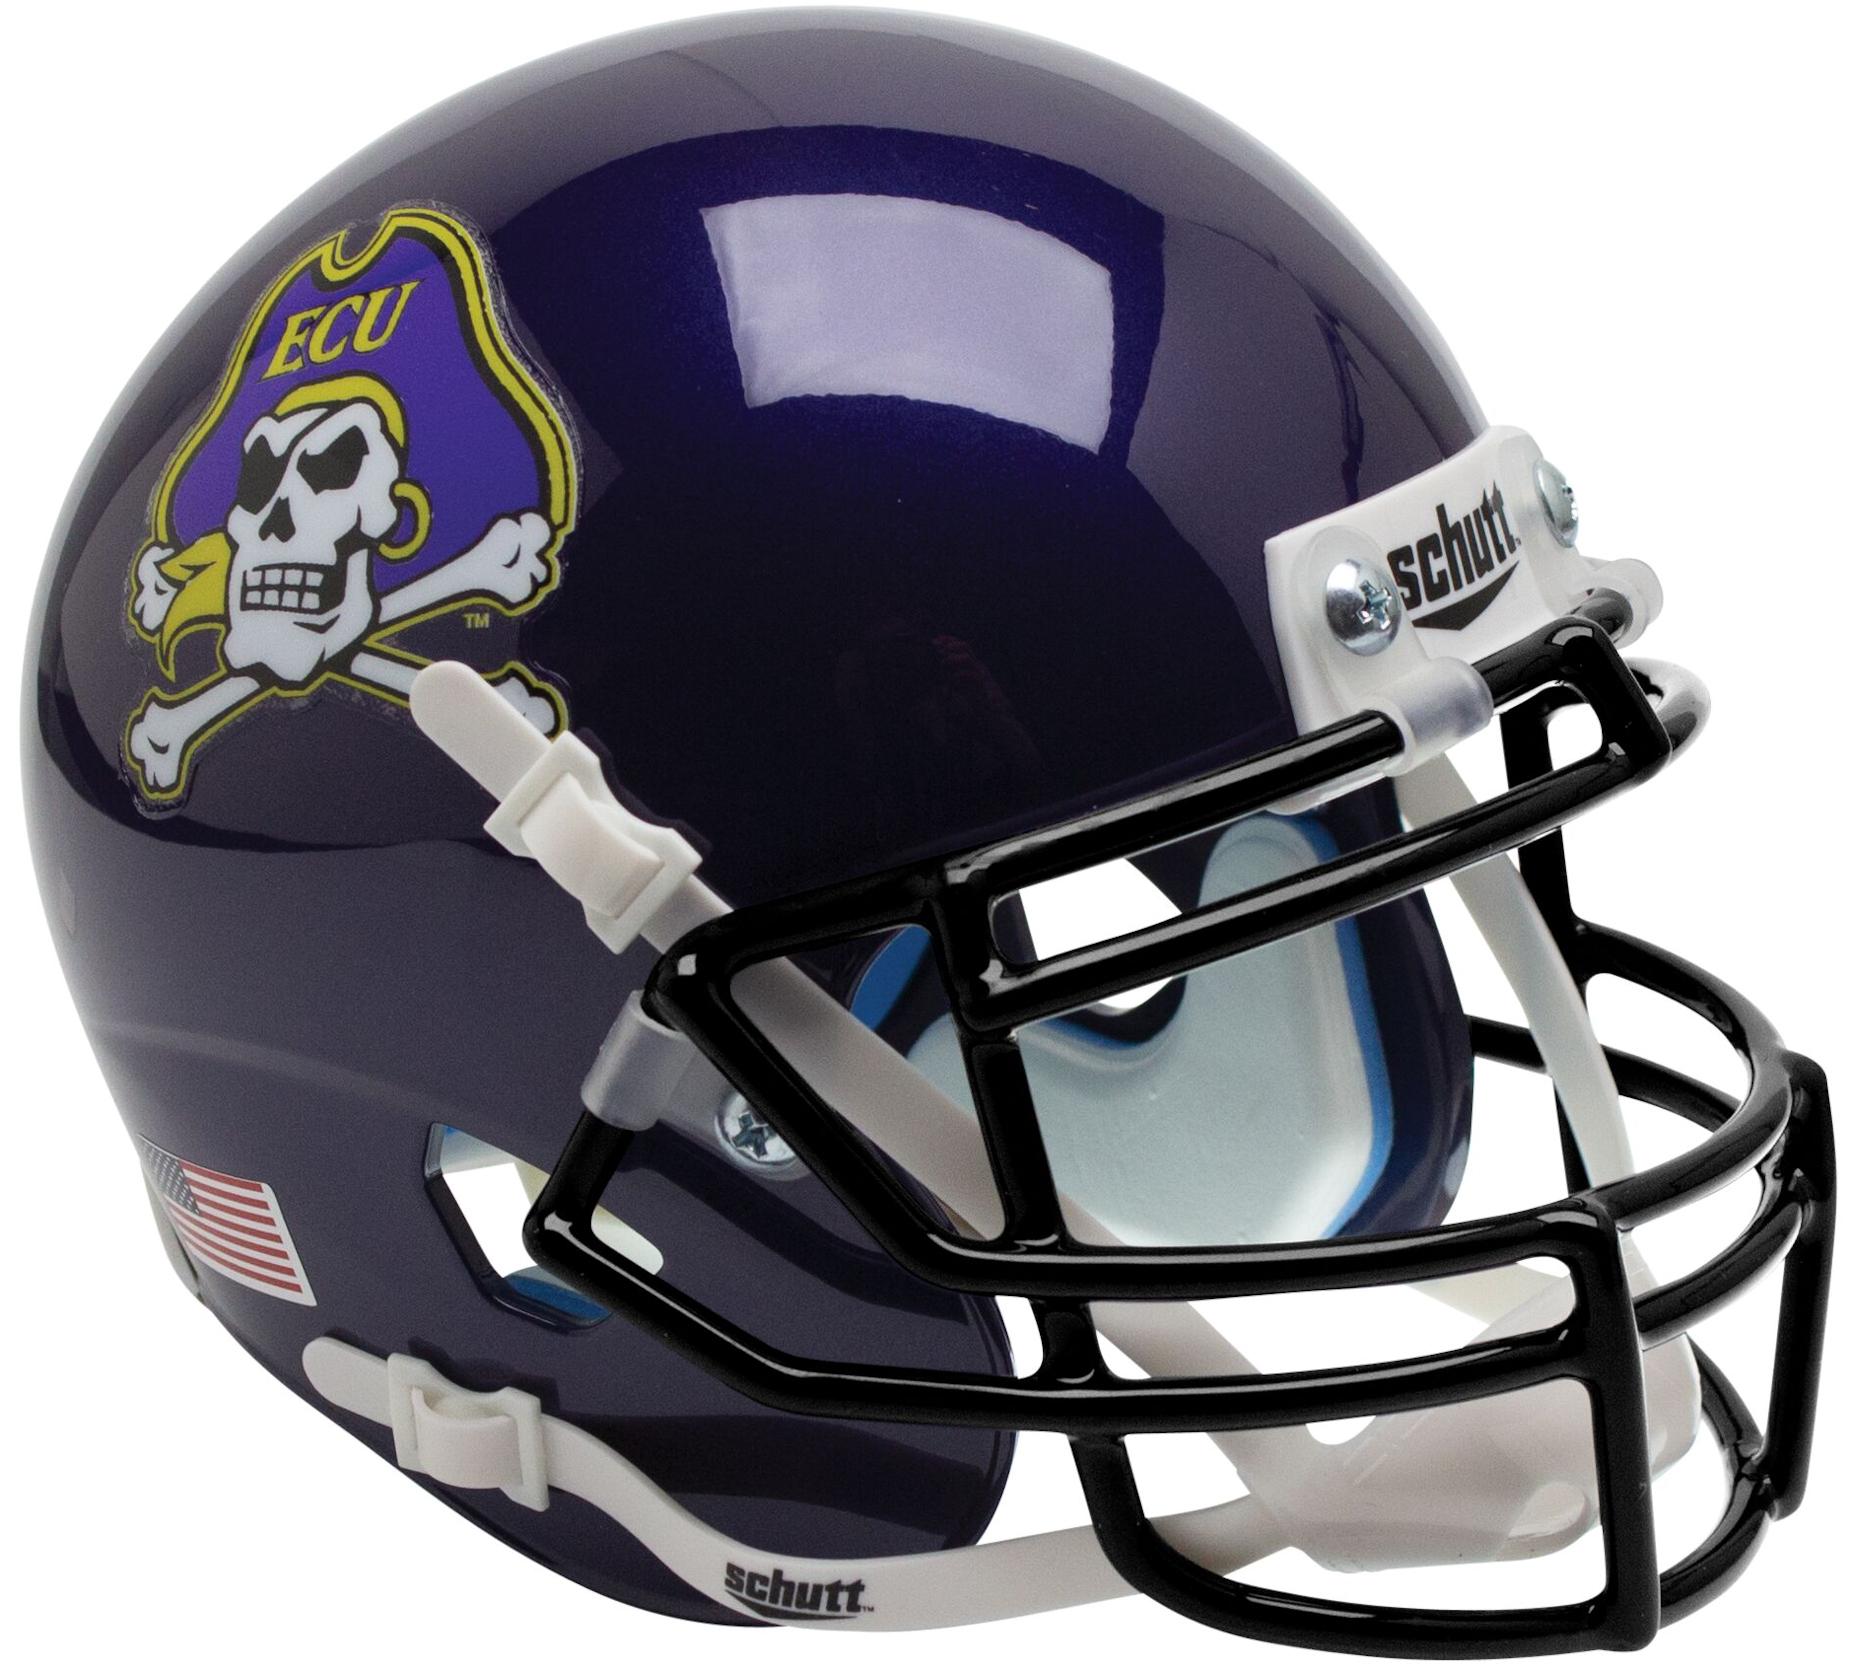 East Carolina Pirates Mini XP Authentic Helmet Schutt <B>Black Mask</B>